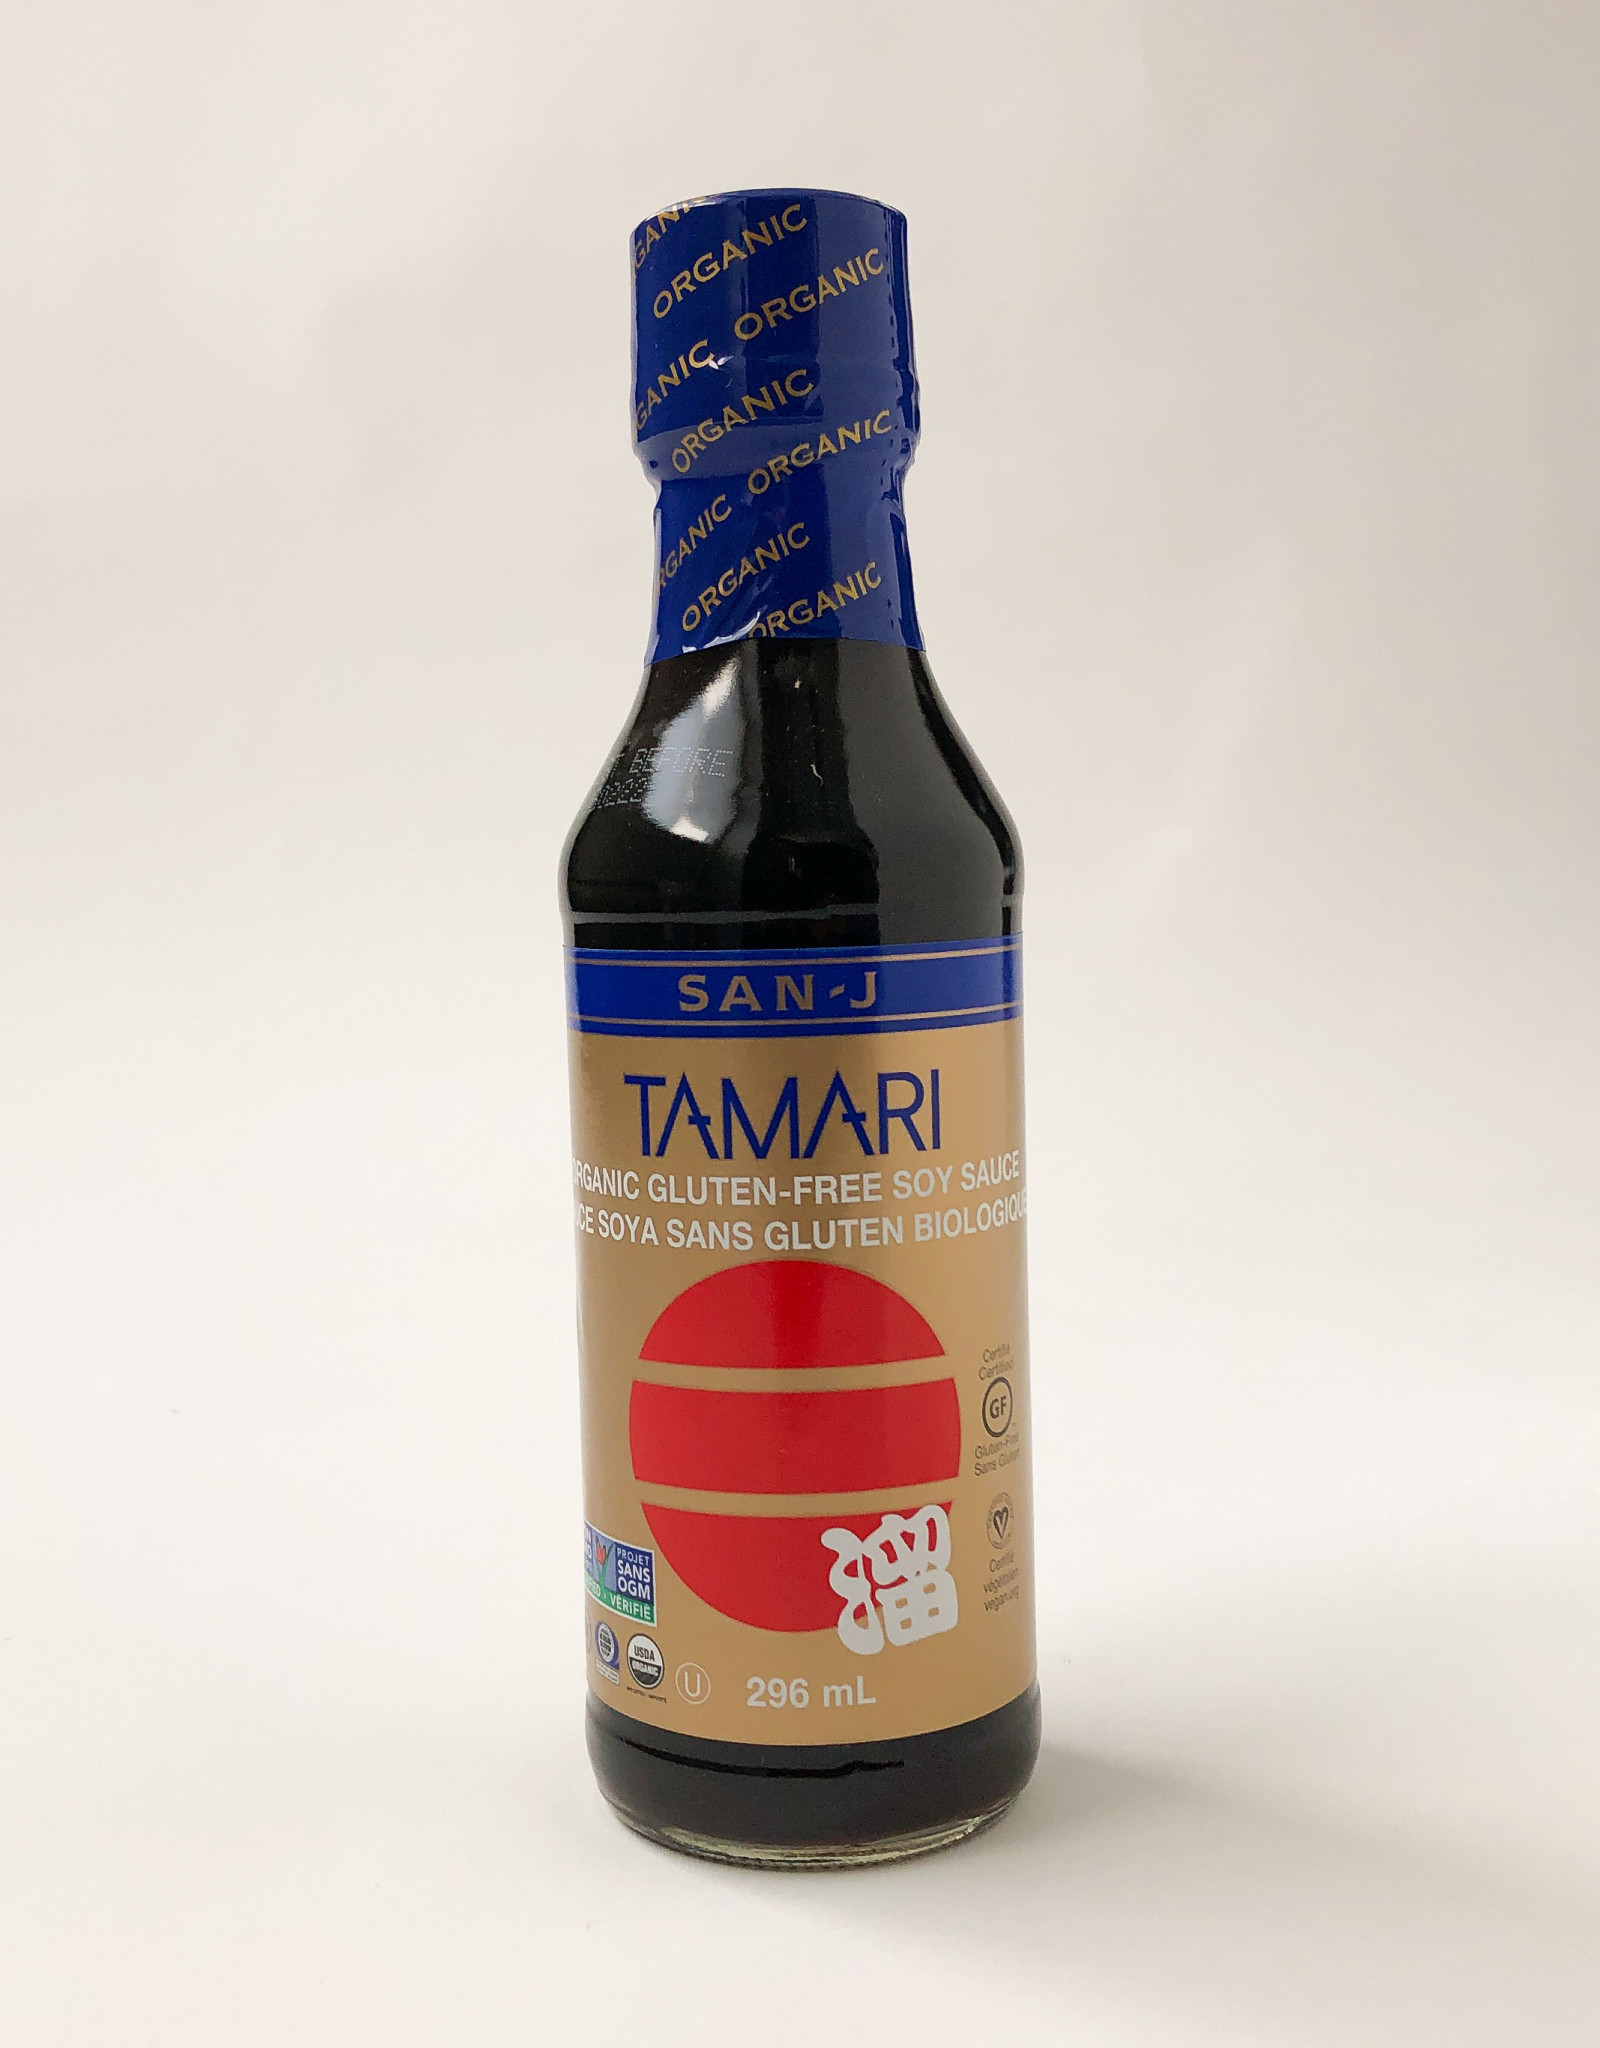 SAN-J SAN-J - Tamari GF Organic, 296ml